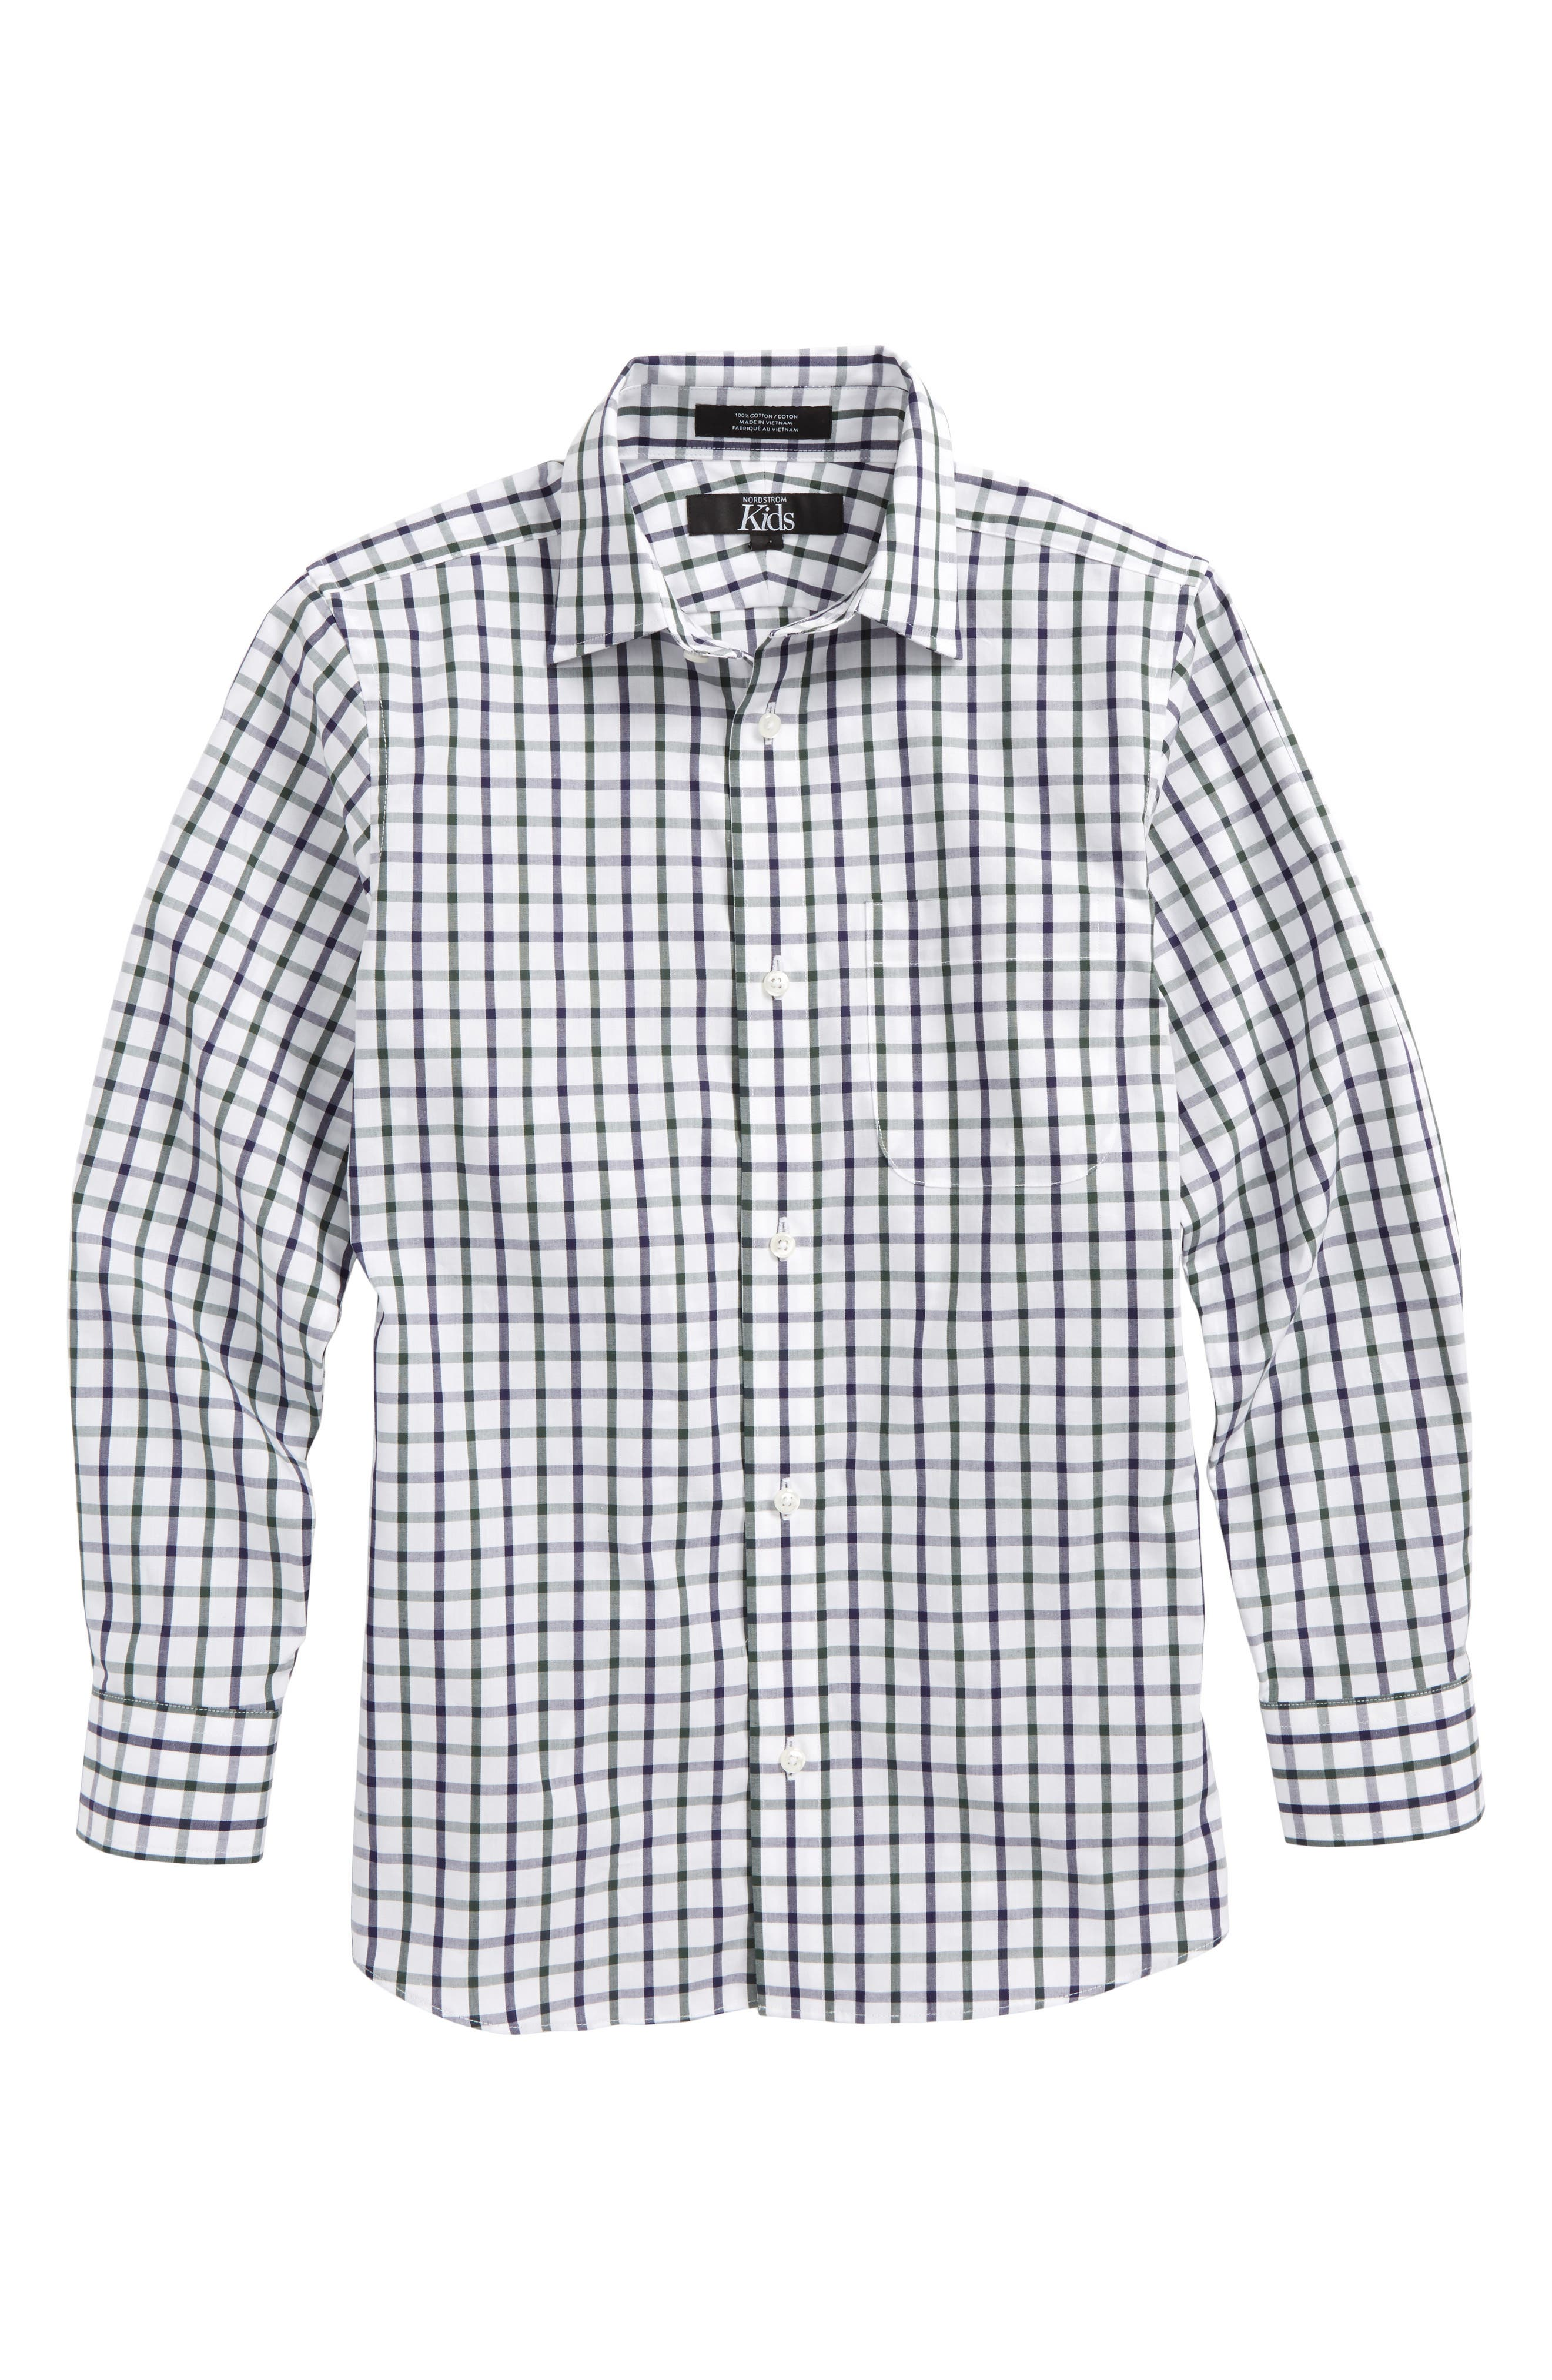 Main Image - Nordstrom Windowpane Plaid Dress Shirt (Toddler Boys & Little Boys)